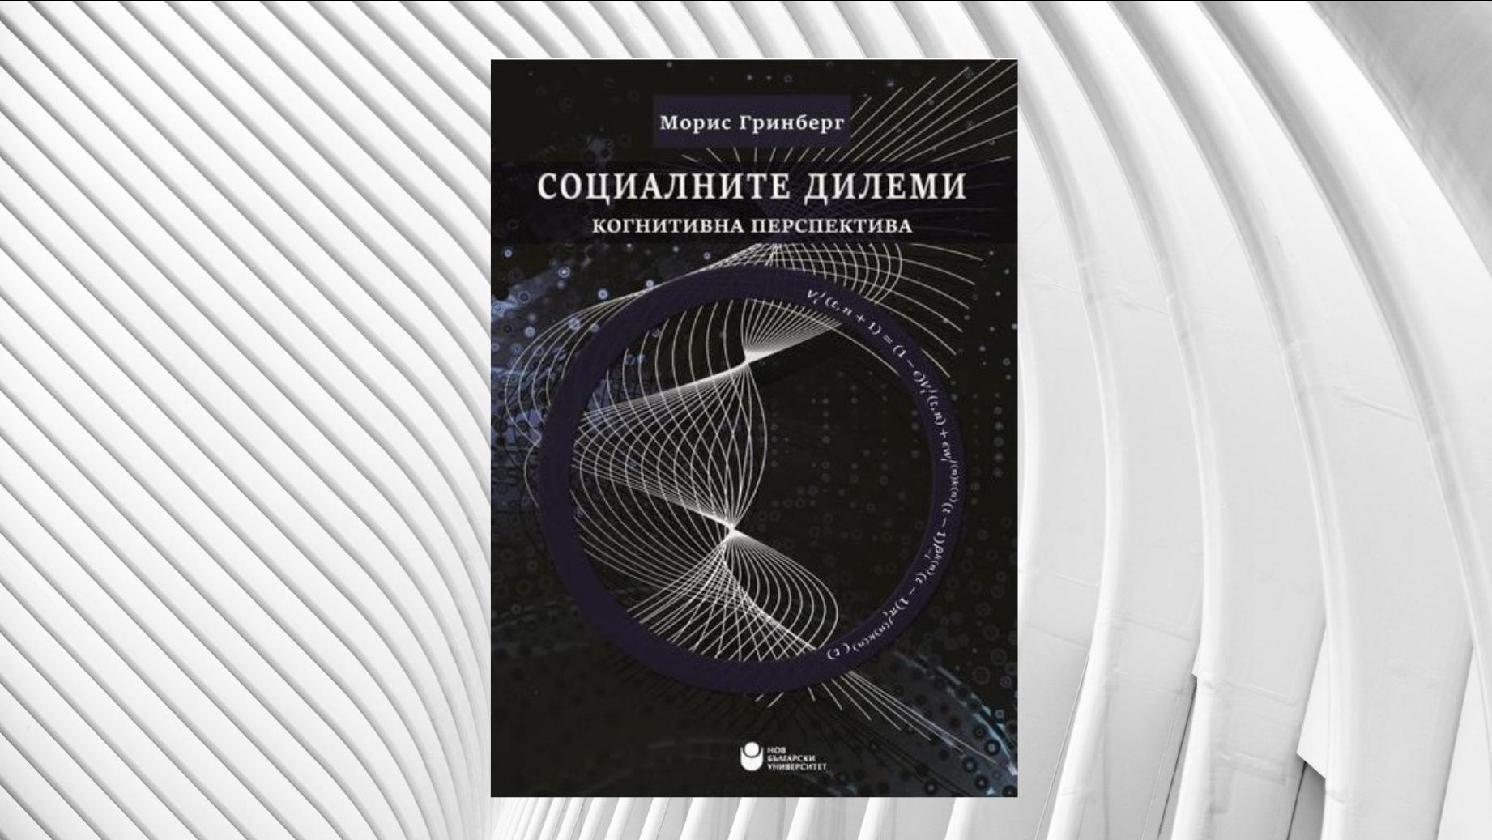 "Представяне на ""Социалните дилеми: когнитивна перспектива"" от доц. д-р Морис Гринберг"